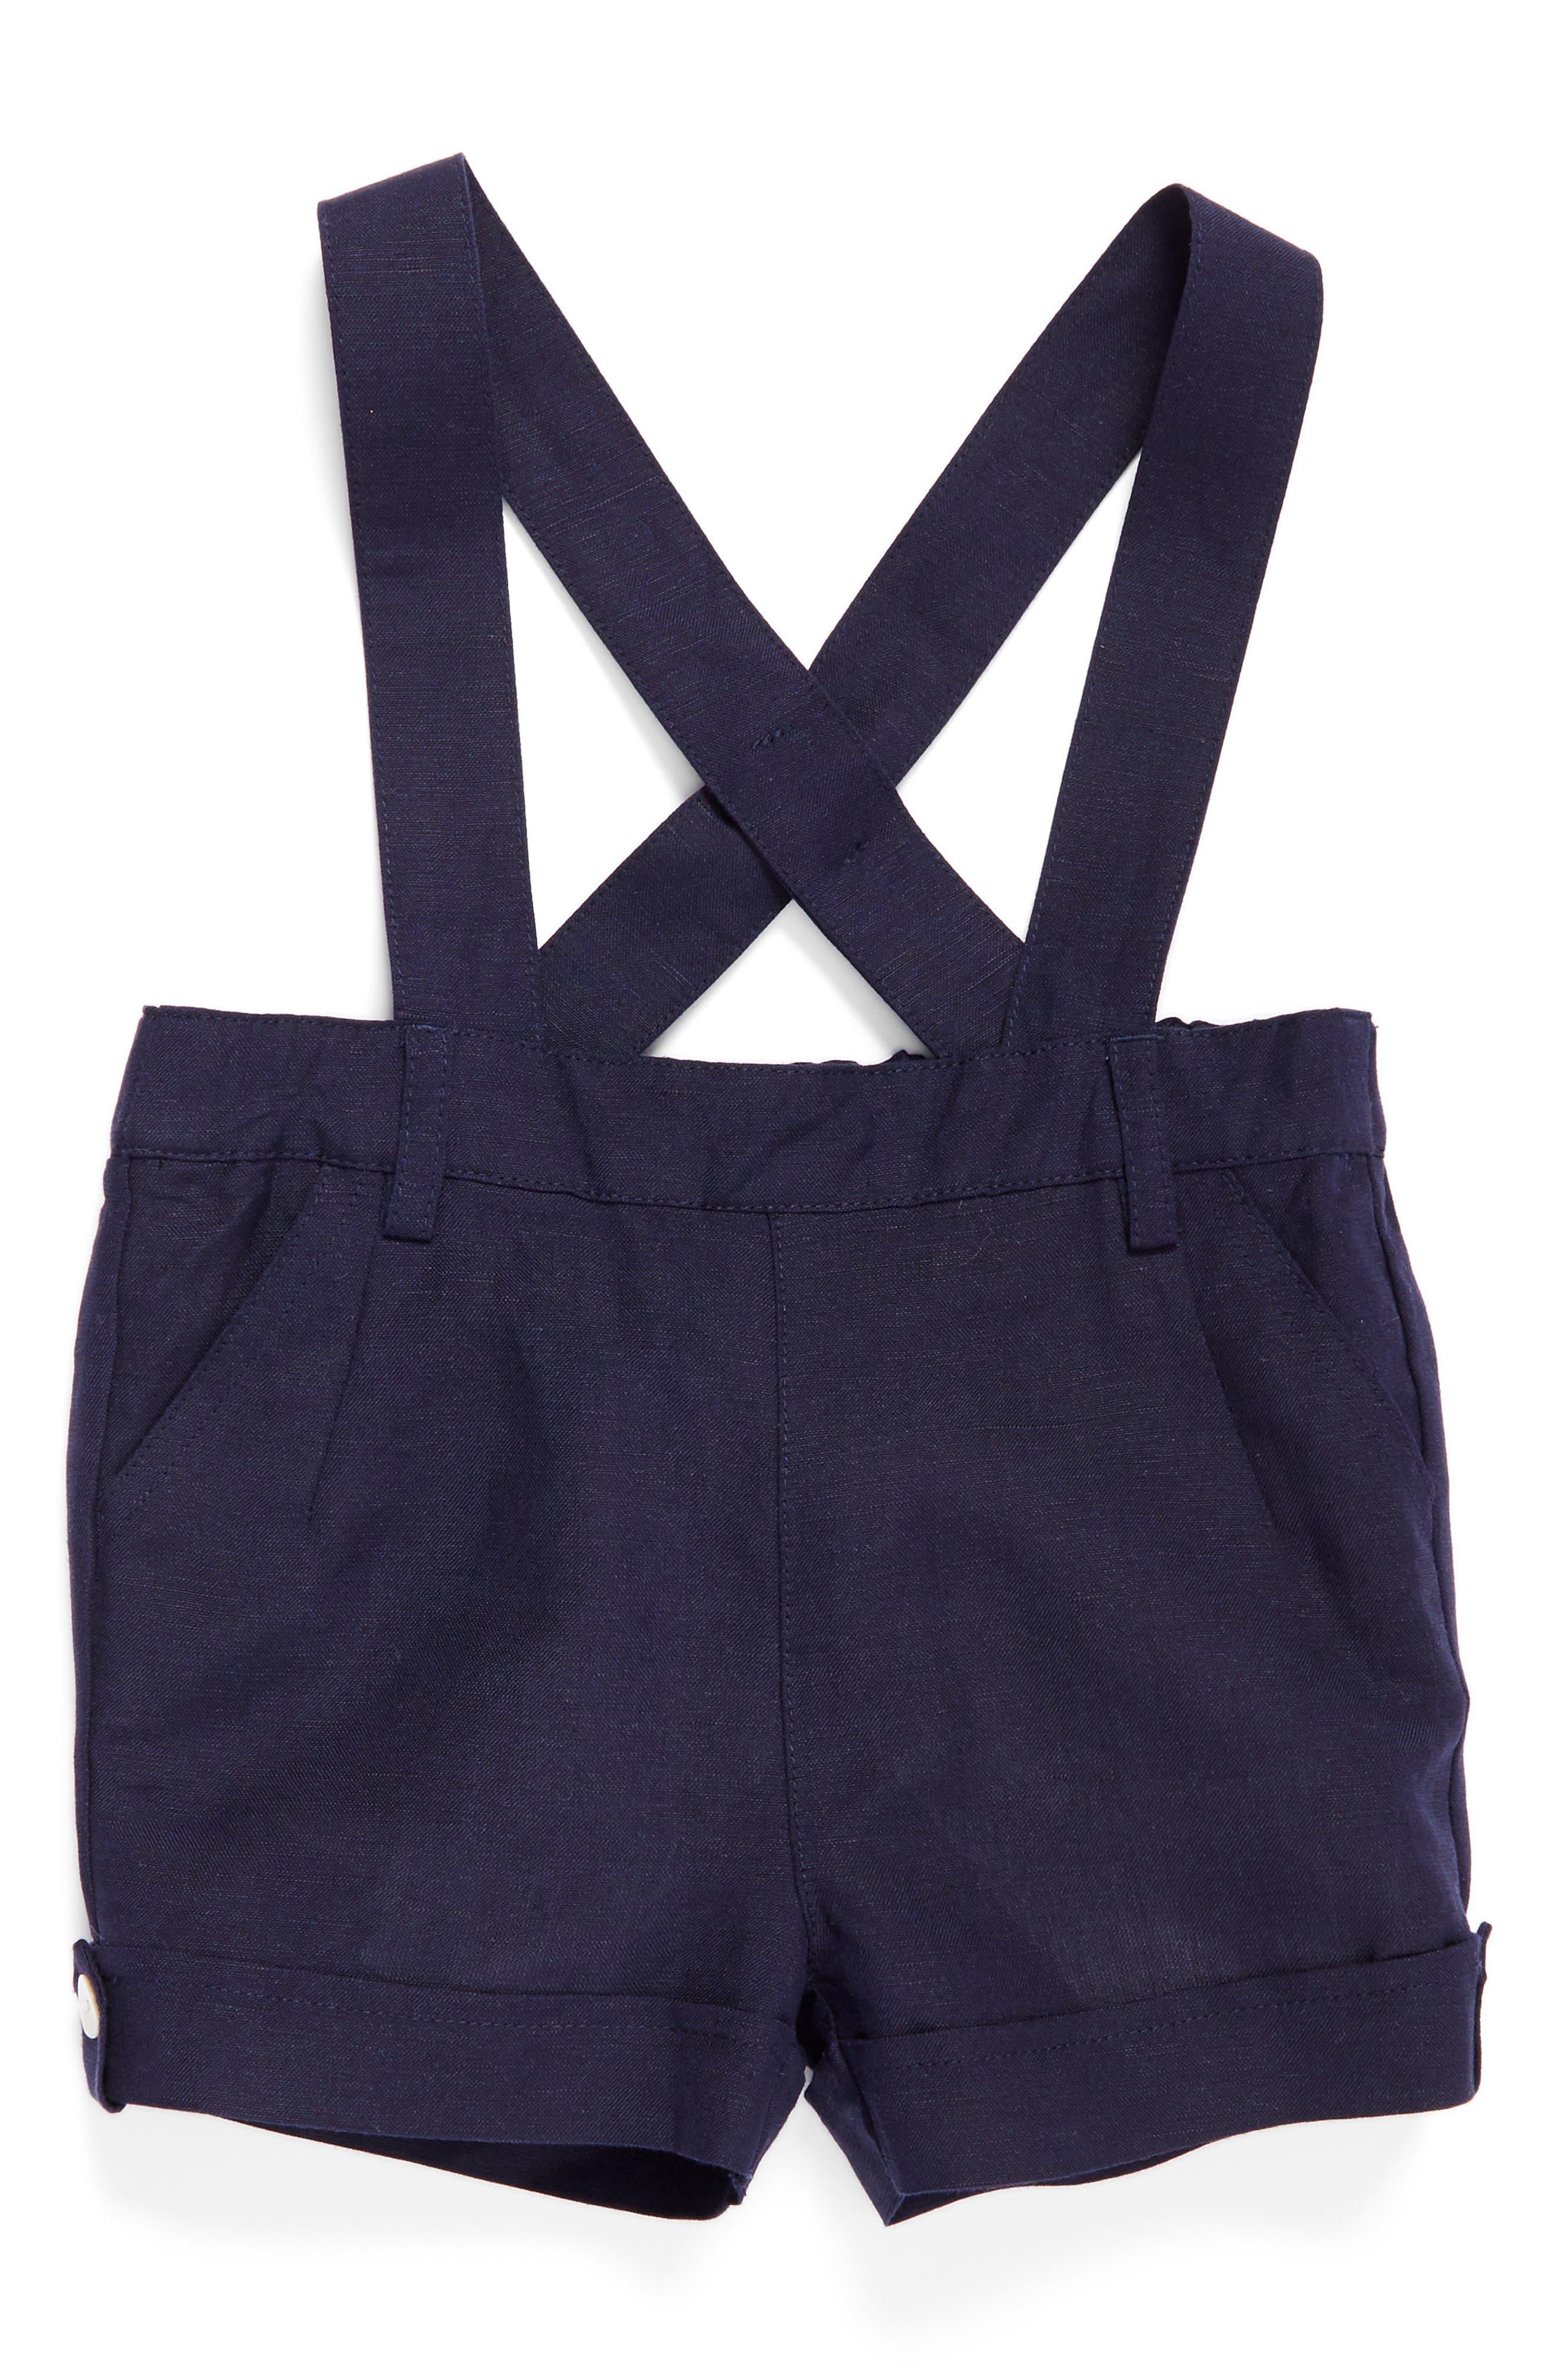 Main Image - Bardot Junior Linen Blend Short Overalls (Baby Boys & Toddler Boys)